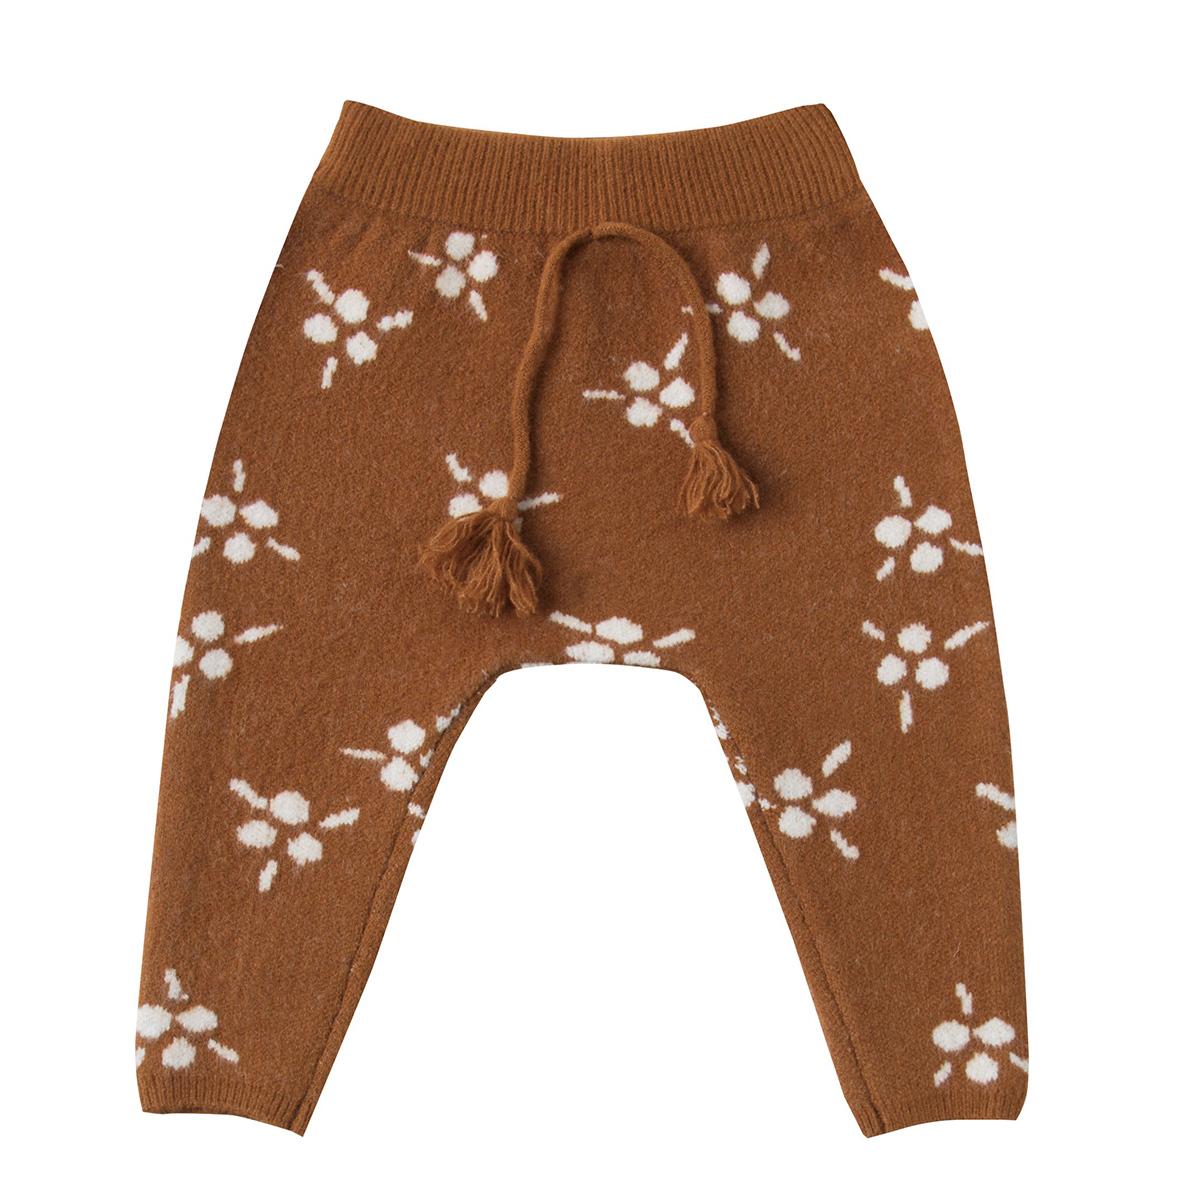 Bas bébé Pantalon Berry Jacquard Marron - 12/18 Mois Pantalon Berry Jacquard Marron - 12/18 Mois